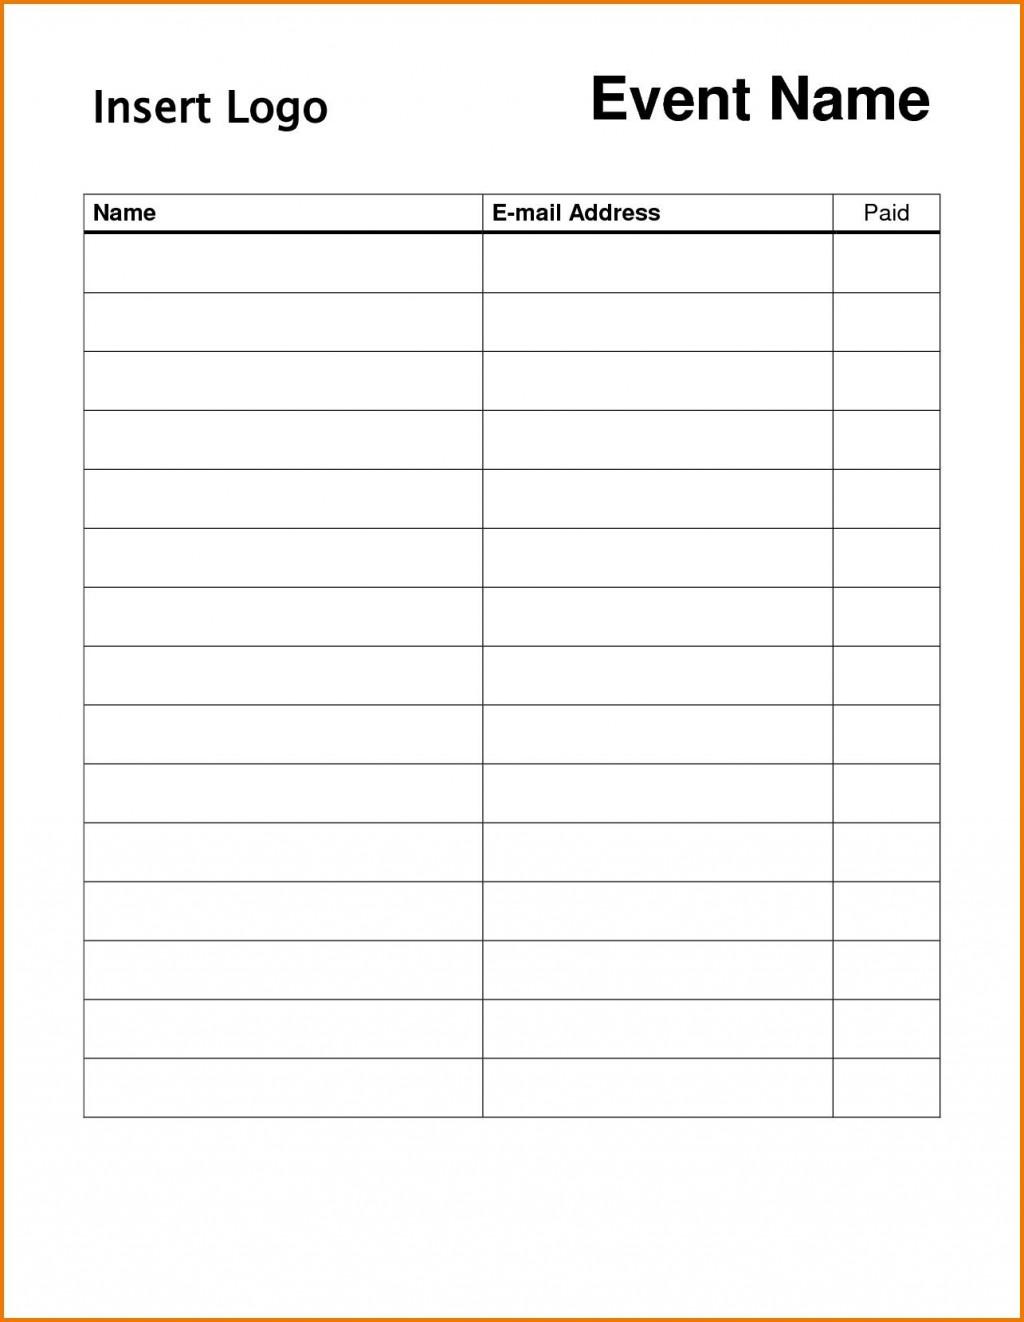 004 Surprising Free Signup Sheet Template Inspiration  Sign Up For Potluck Google Doc Volunteer InLarge